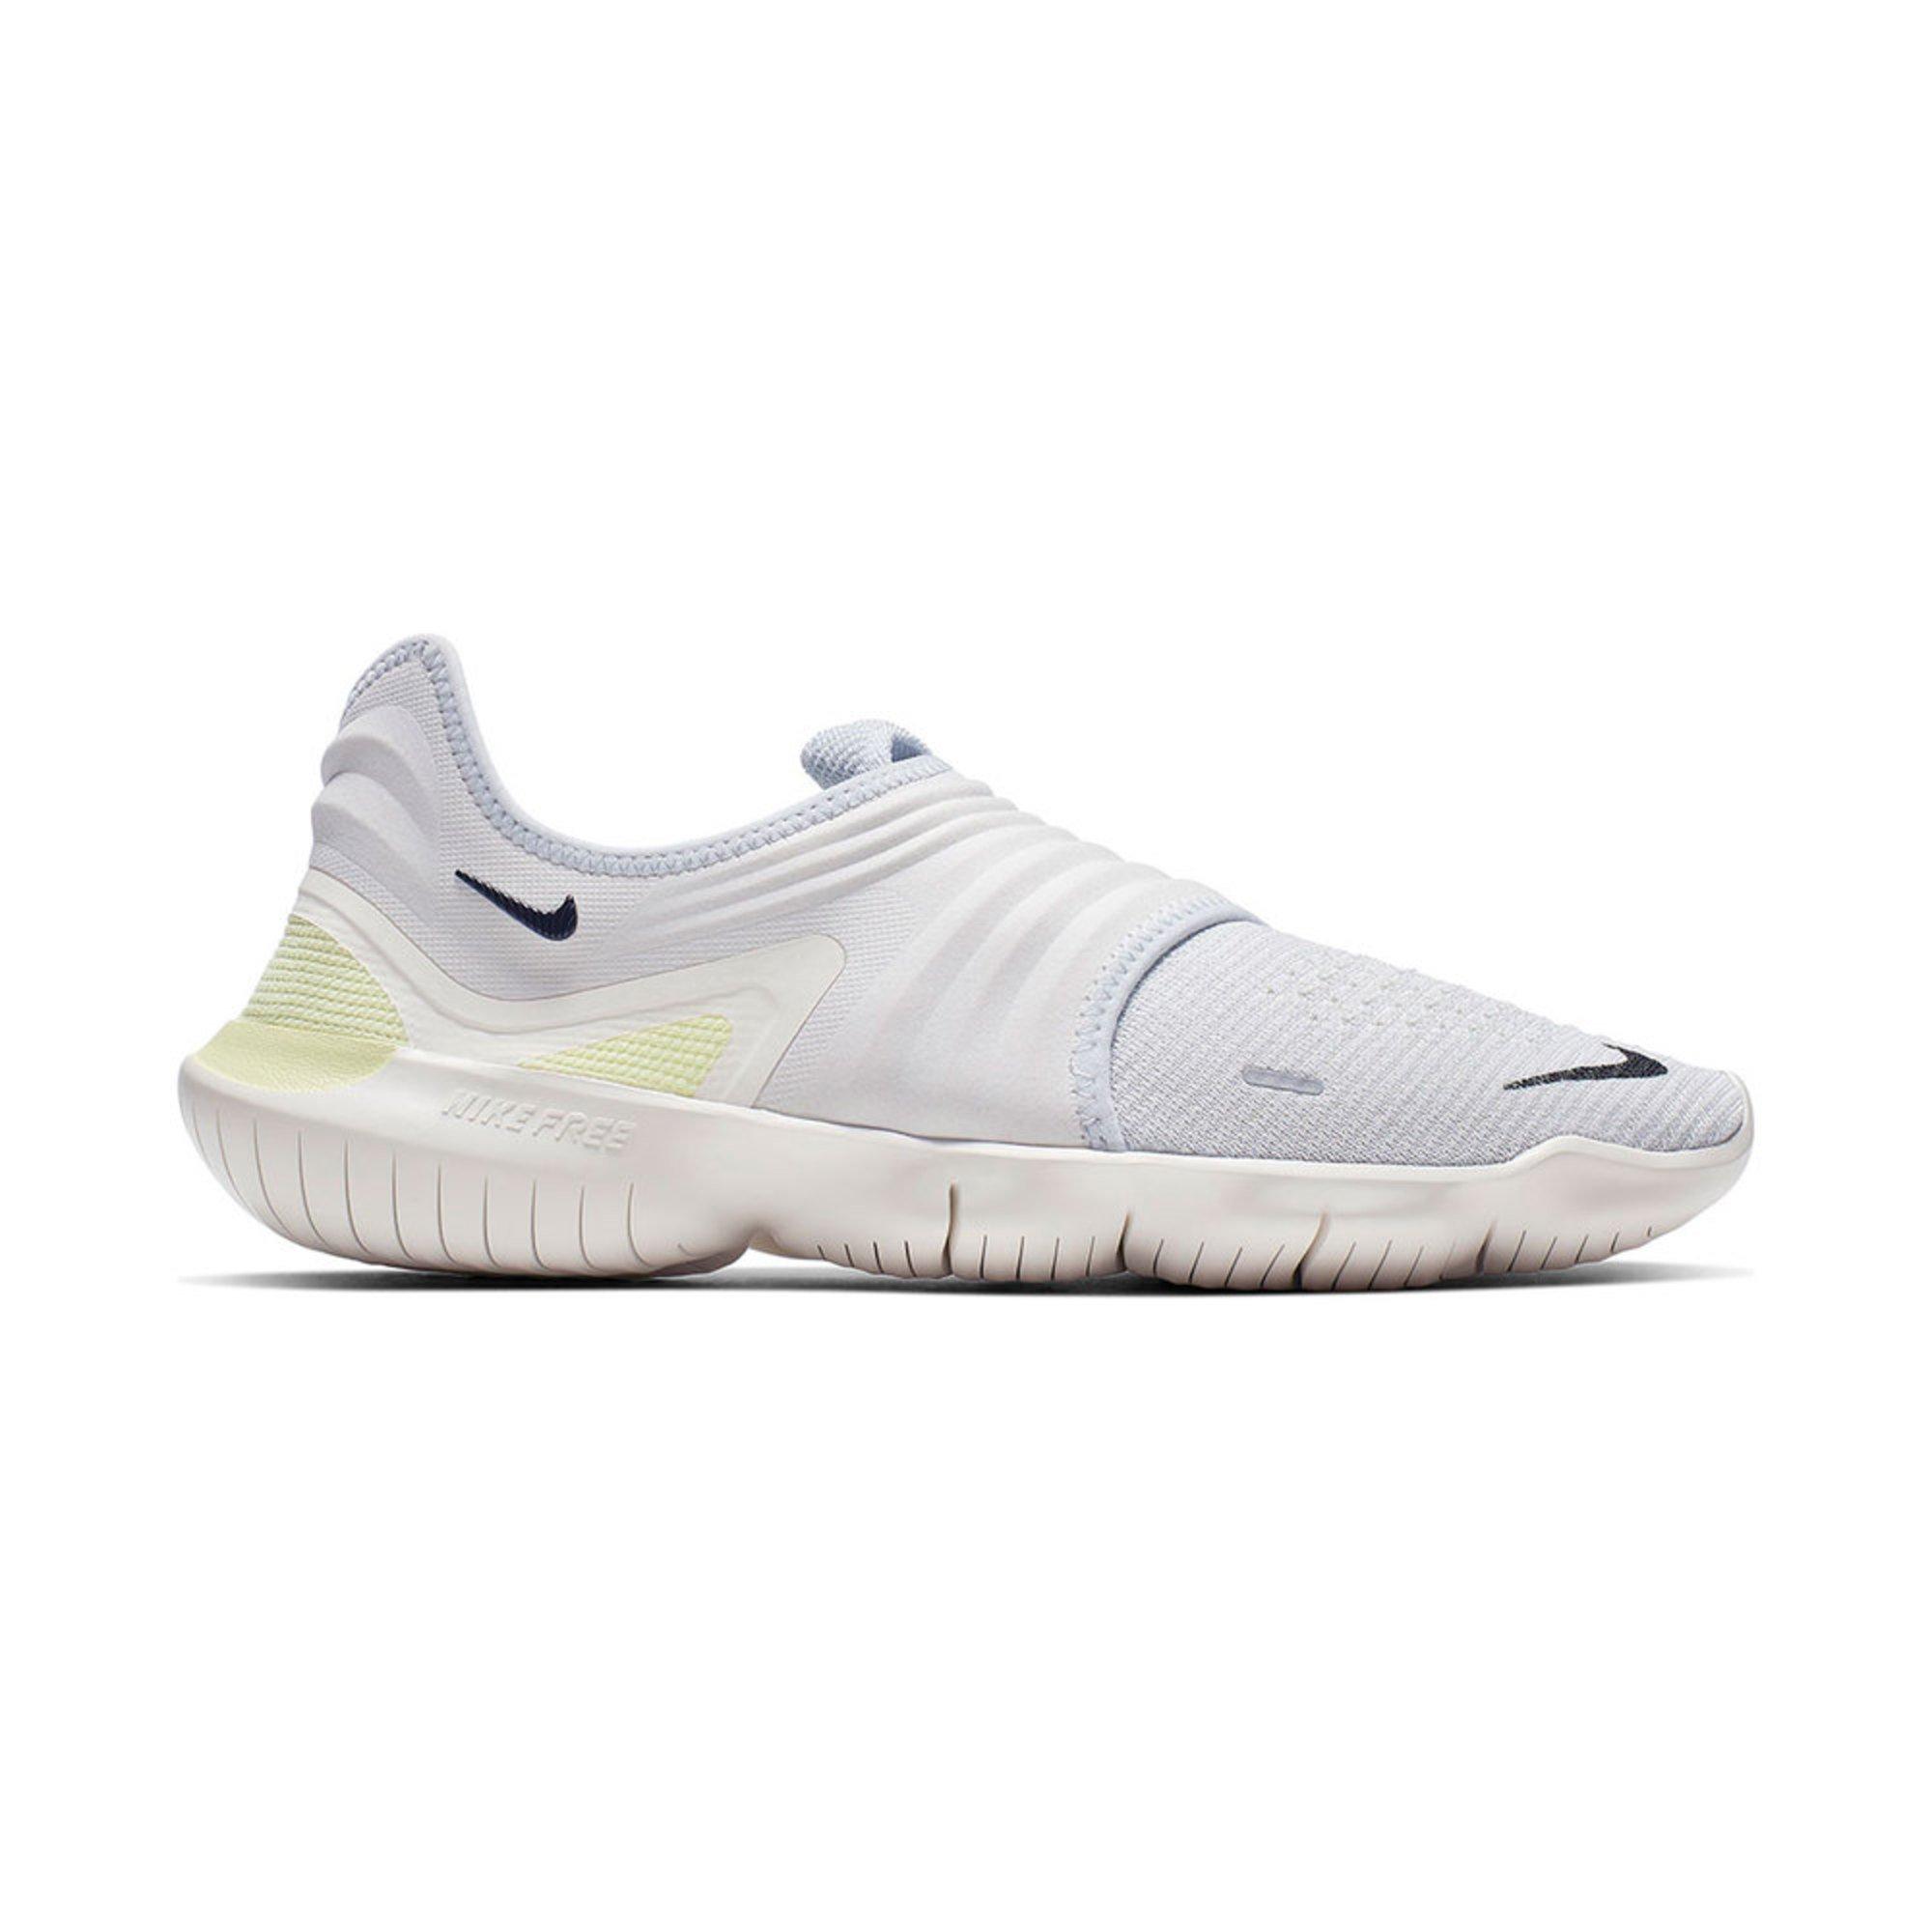 e8098772765 Nike. Nike Men s Free RN Flyknit 3.0 Running Shoe